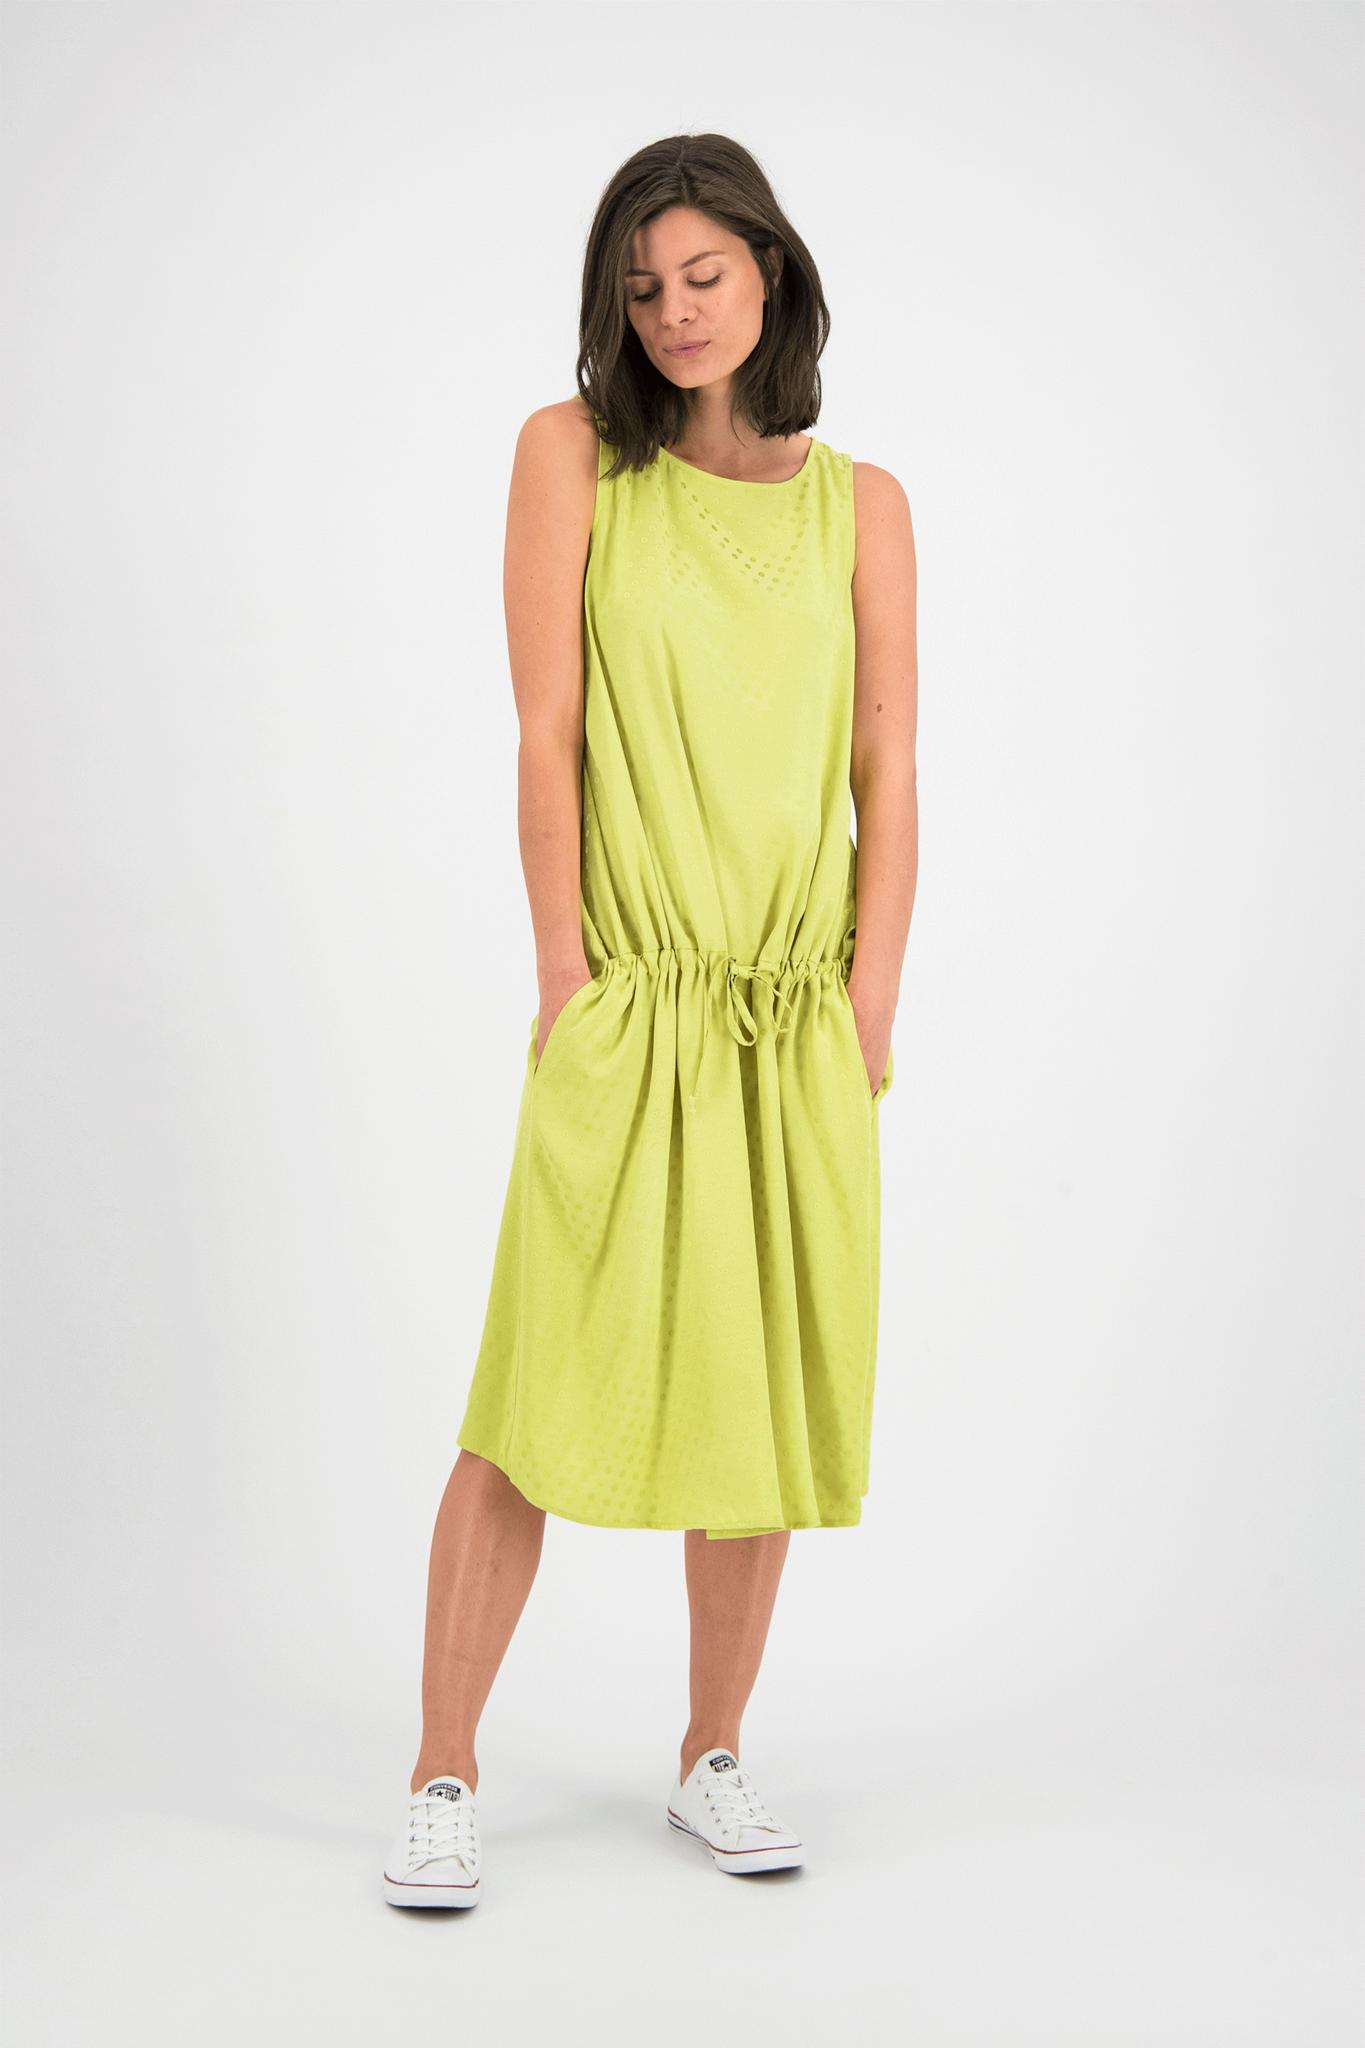 SYLVER Jacquard Dress - Limoengeel